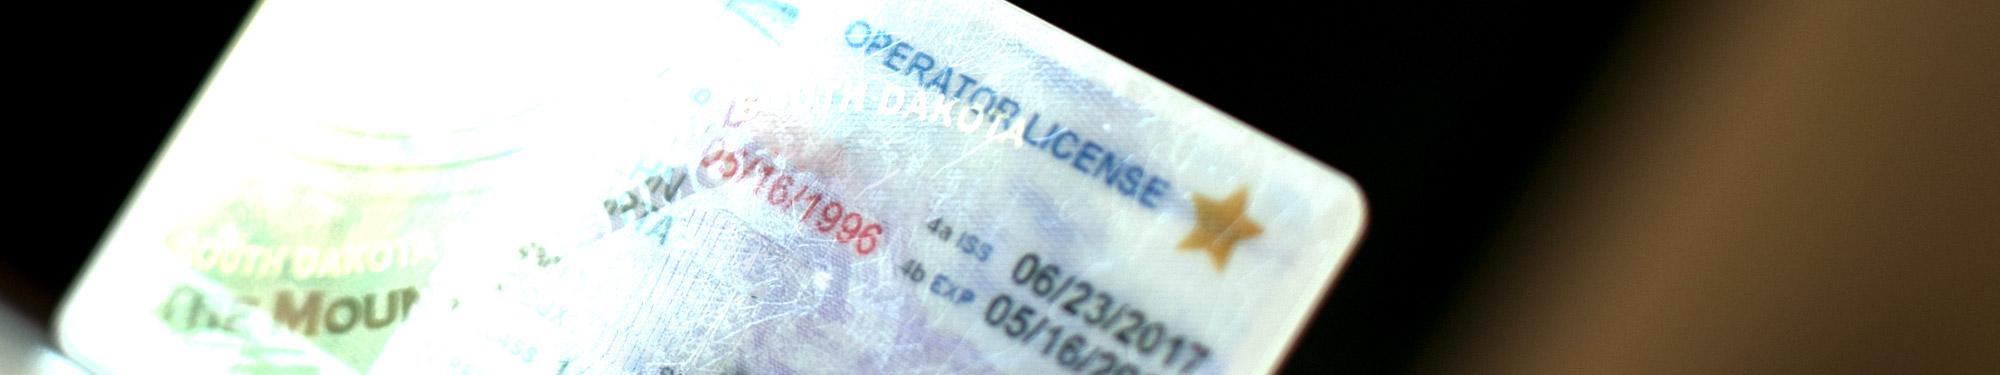 south dakota drivers license renewal stations